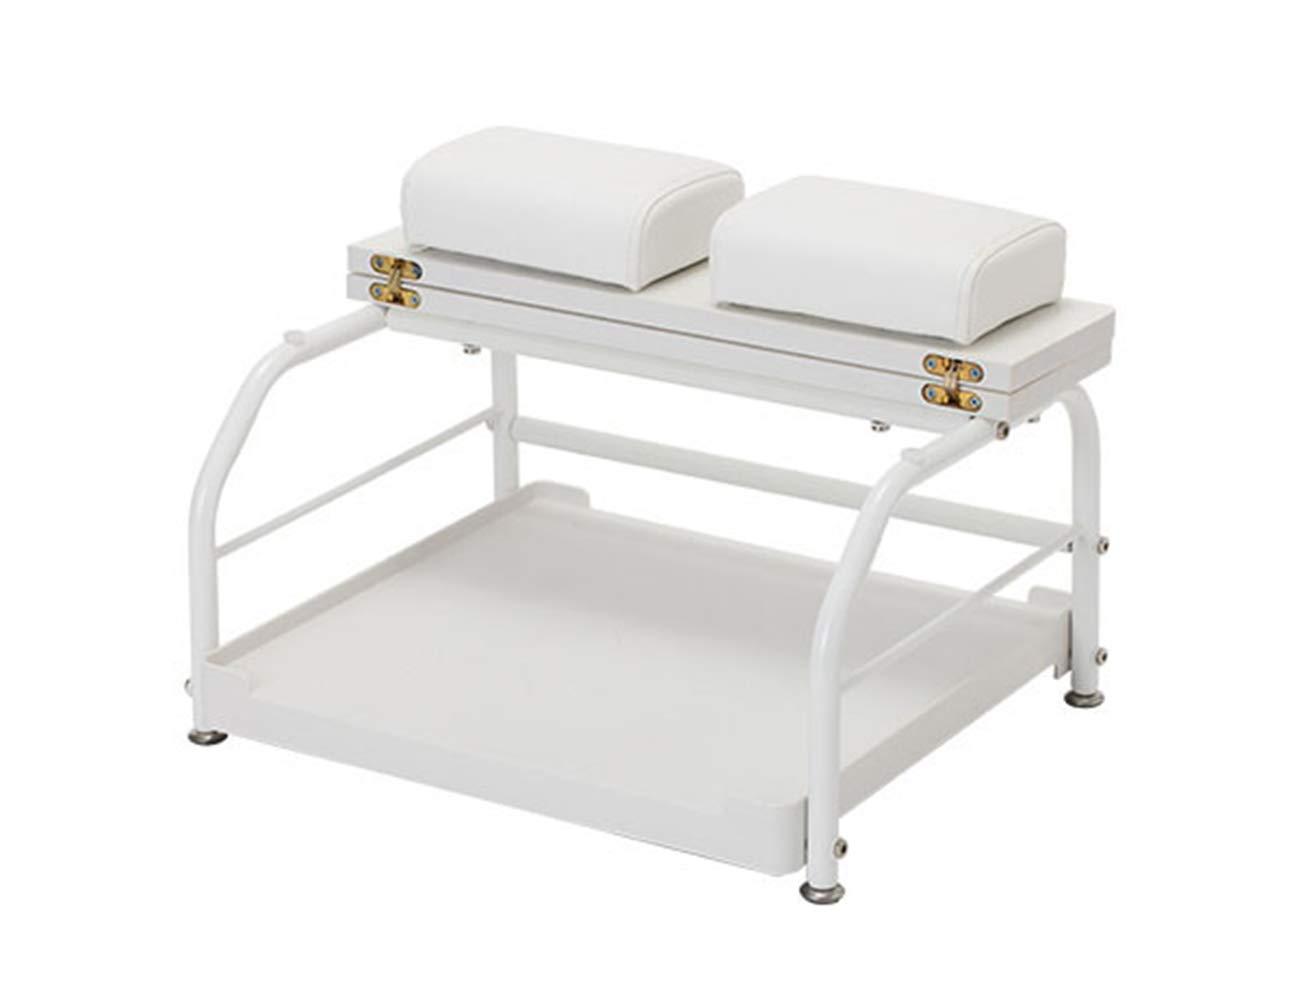 Beauty Salon Or Nail Salon Portable Trolley Cart For Foot Rest Or Pedicure Elitzia ET30116